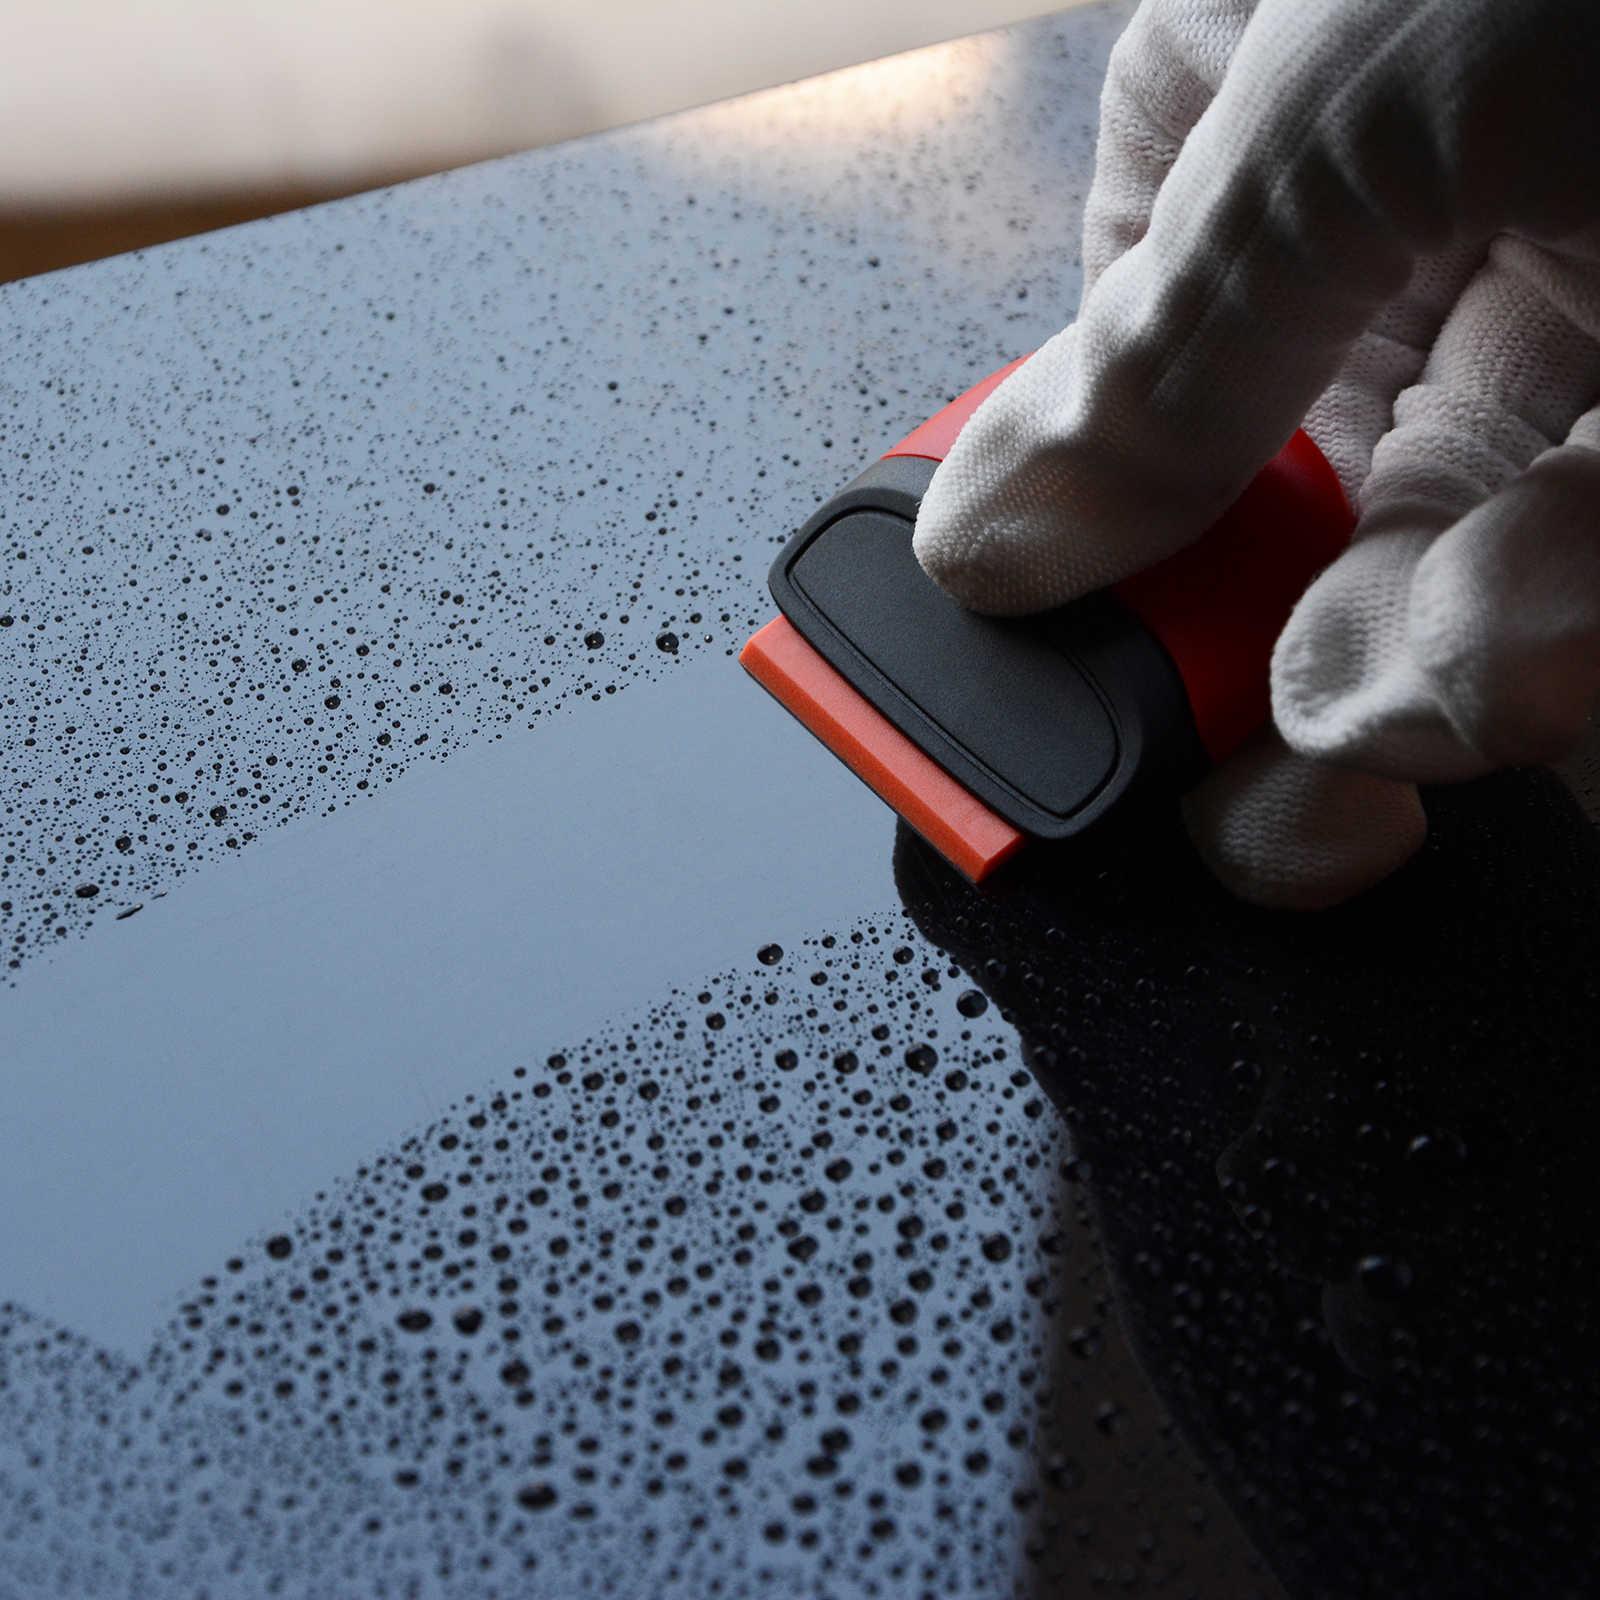 EHDIS รถไวนิลห่อสติกเกอร์แม่เหล็ก Stick Squeegee Scraper เช็ดเครื่องมือชุดคาร์บอนไฟเบอร์ฟอยล์ฟิล์มห่อรถยนต์อุปกรณ์เสริมชุด